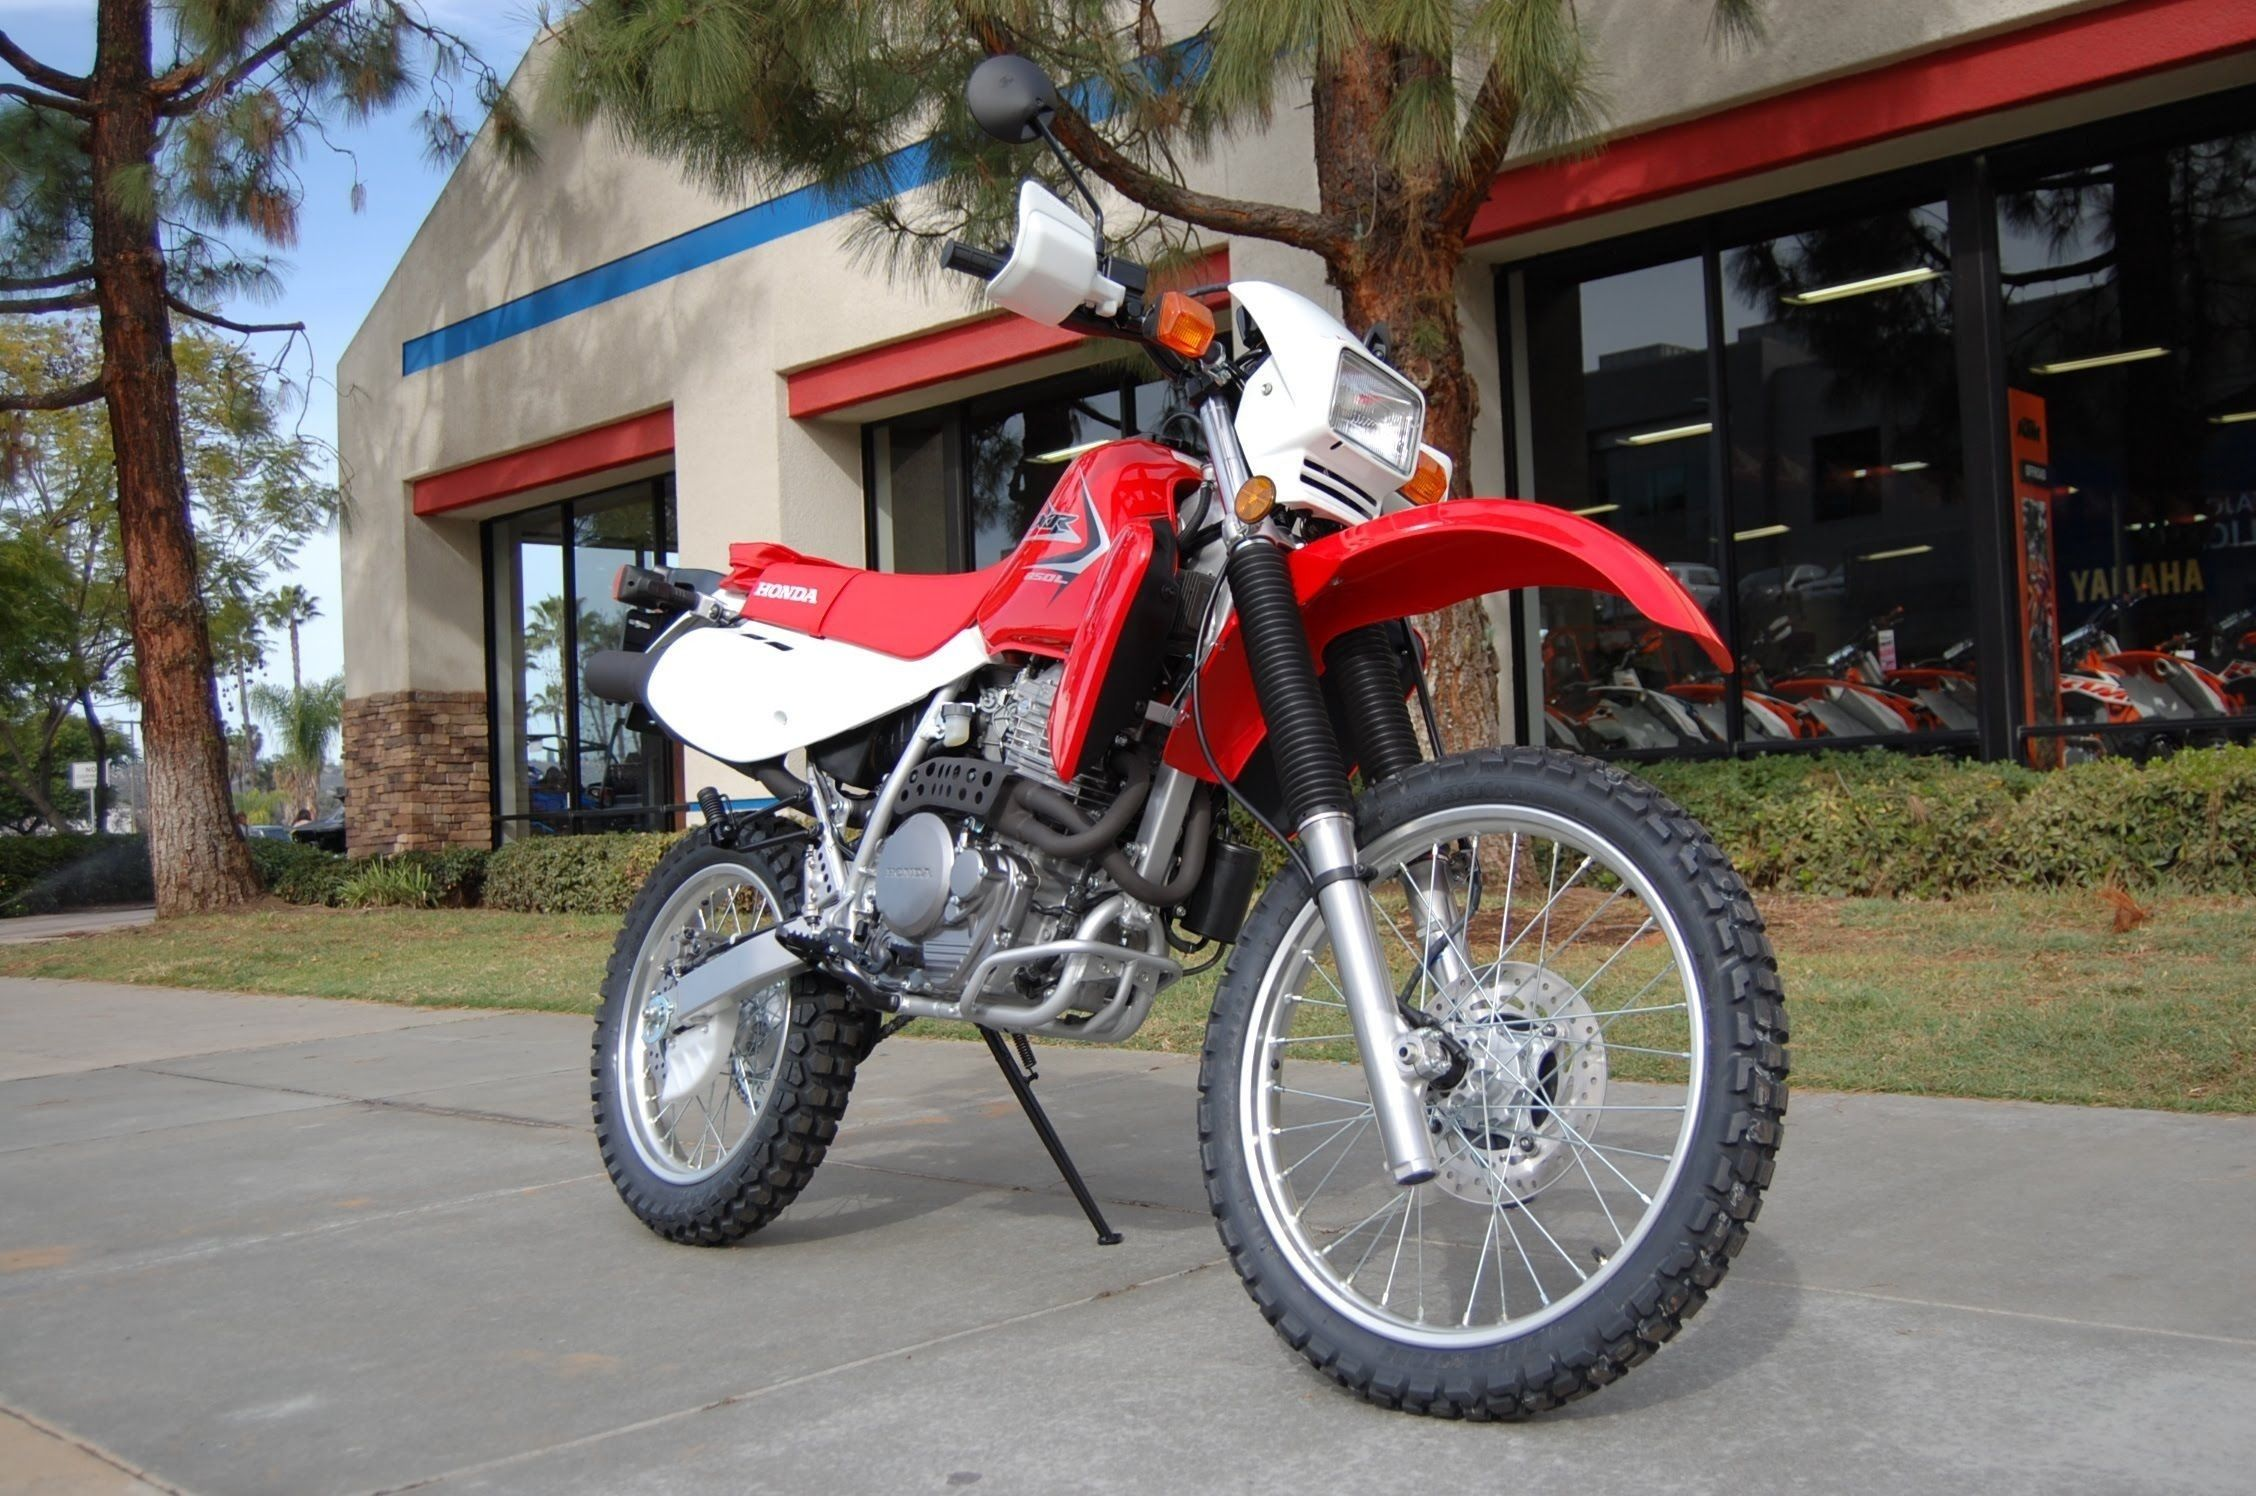 2019 Honda Xr650l Price Car Gallery Honda Dirtbikes Bmw Motorcycles